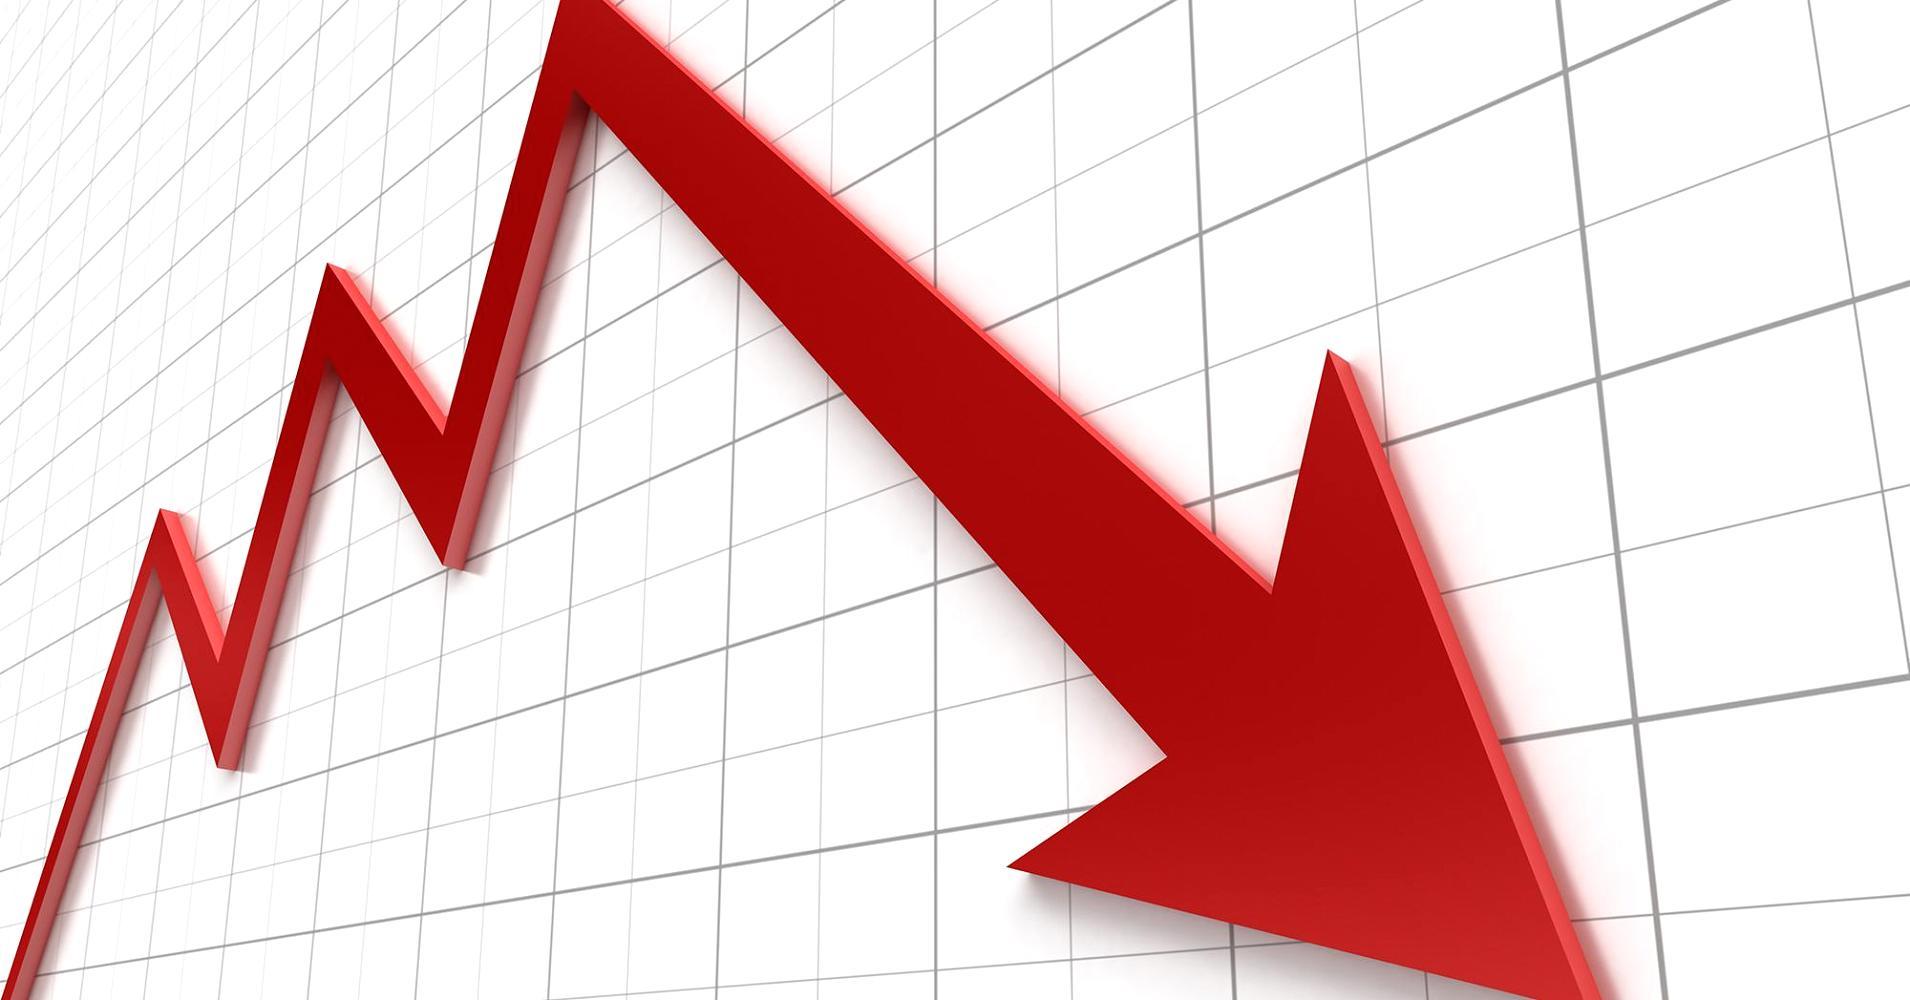 کاهش قیمت آهن در بازارآهن